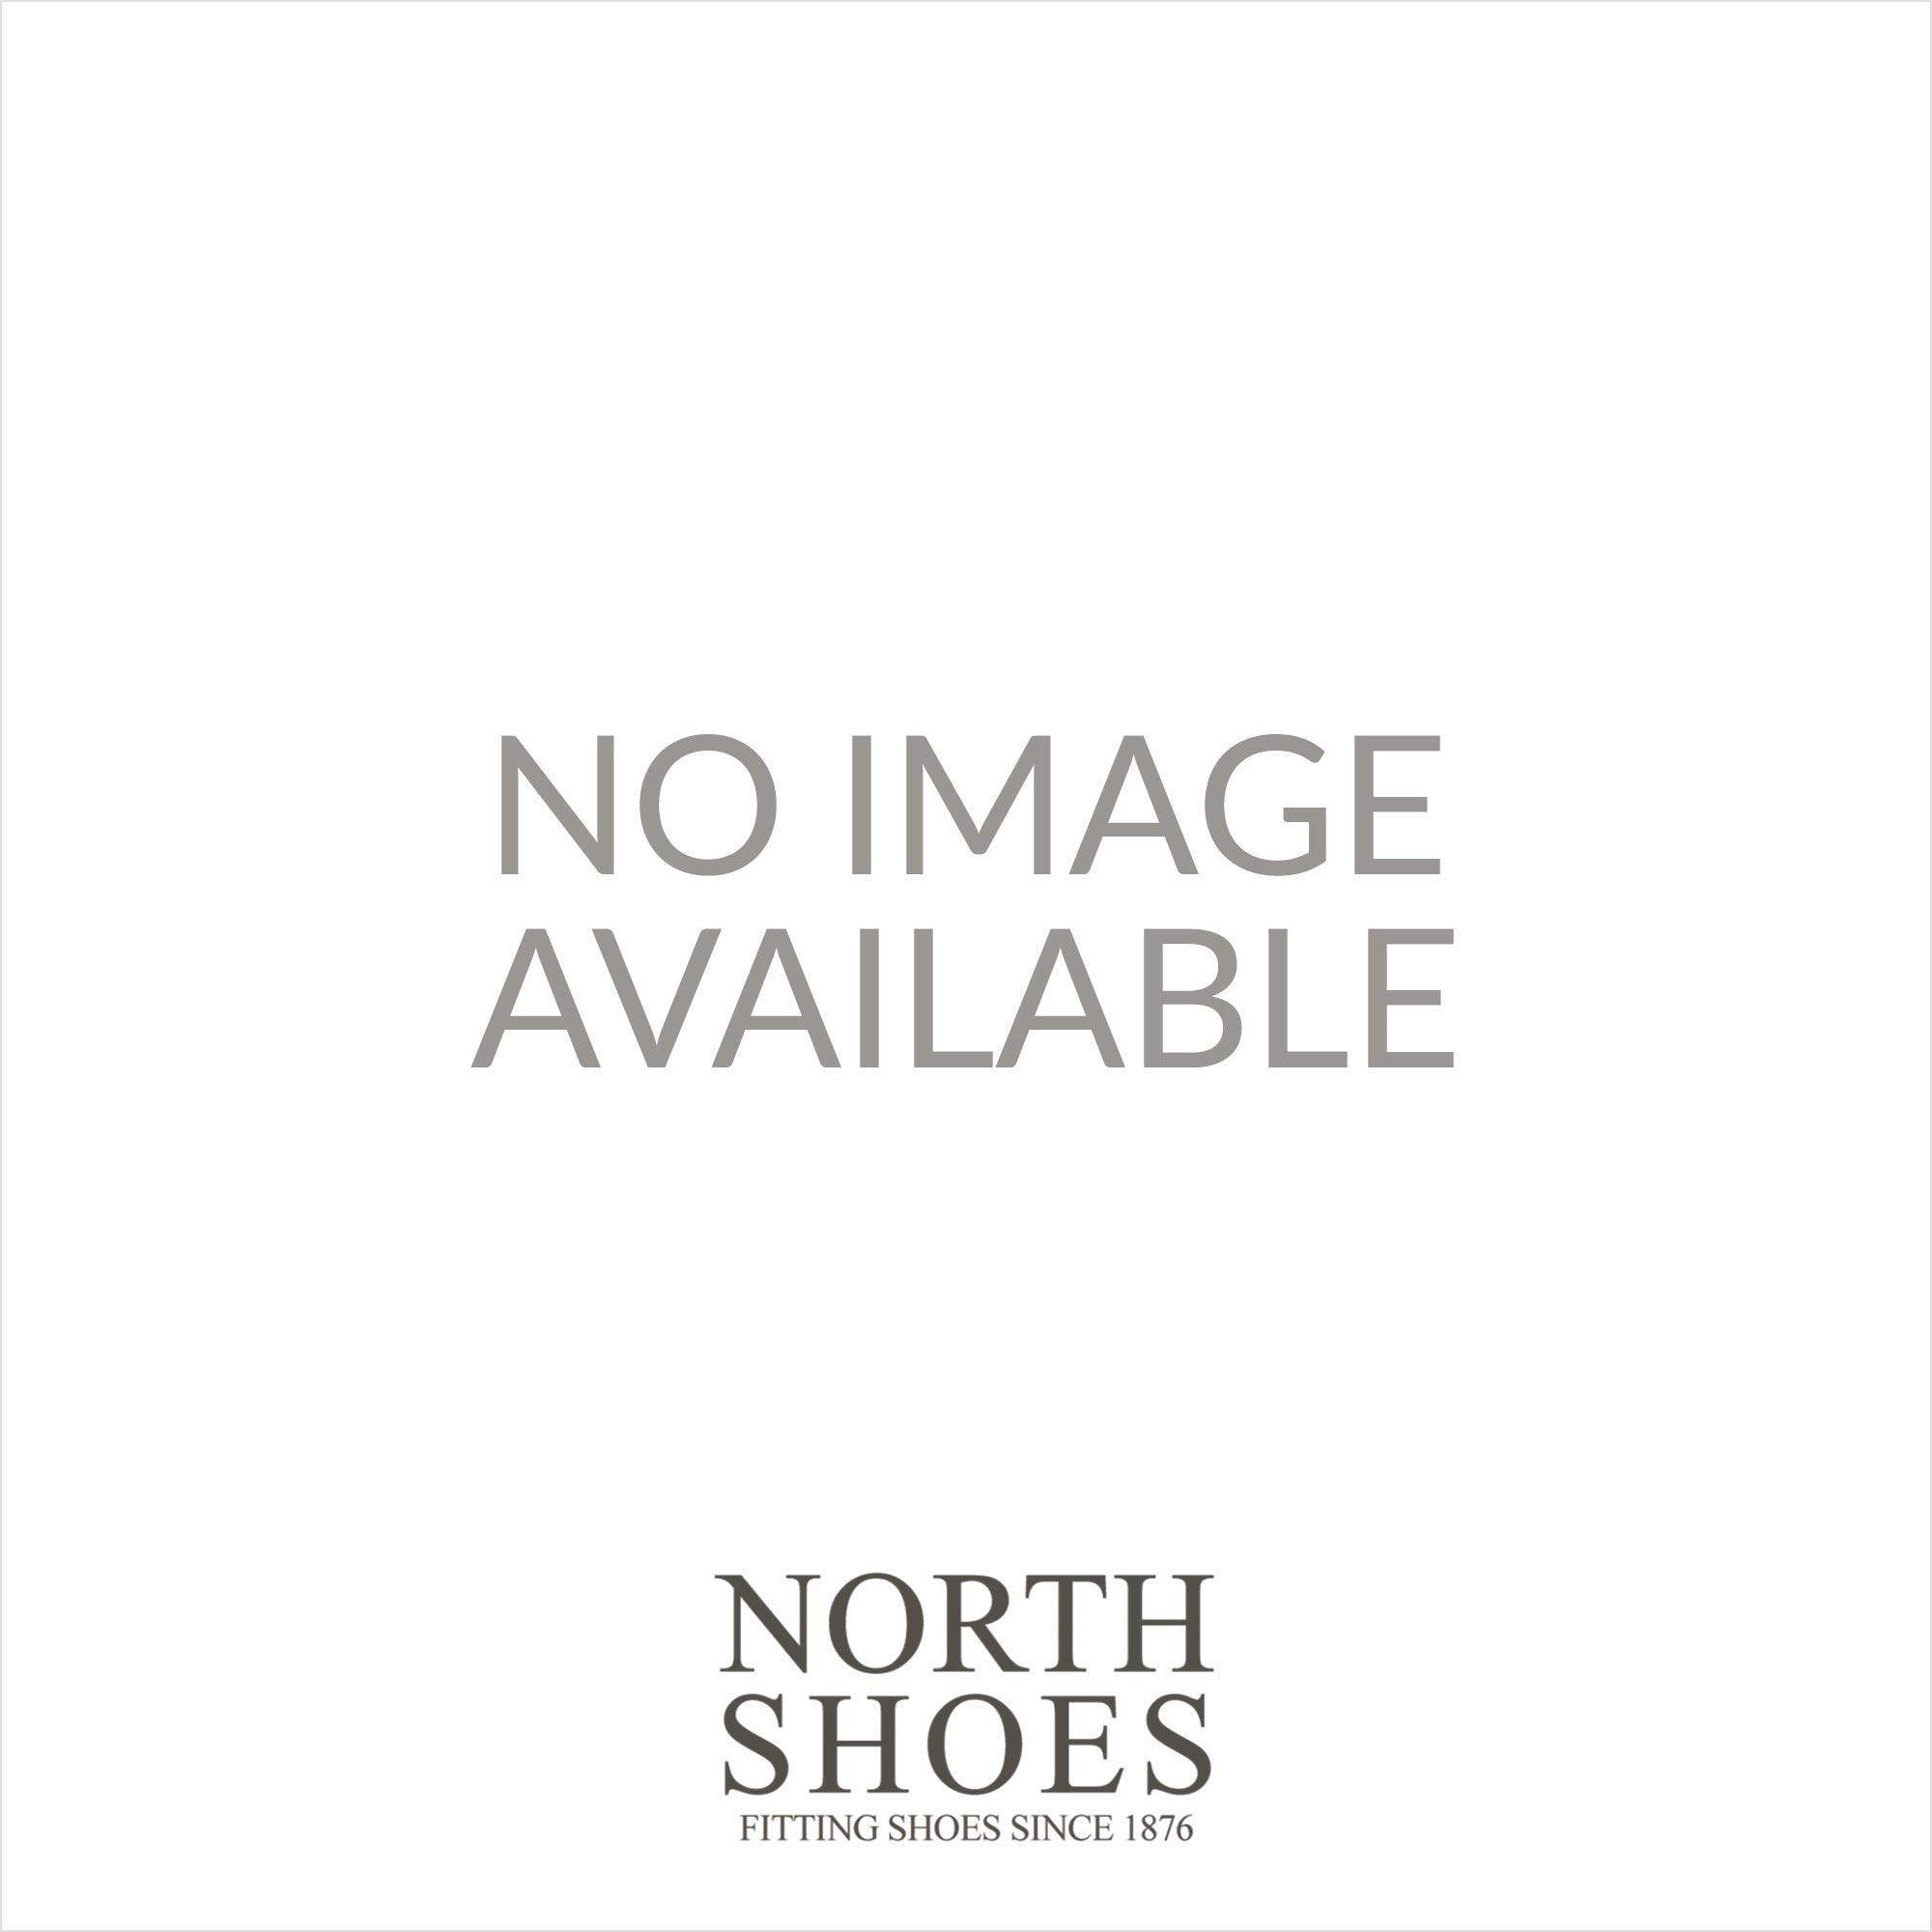 e3a819186d8d Skechers 14680 Grey Rubber Womens Toe Post Flip Flop Sandal - Skechers from North  Shoes UK